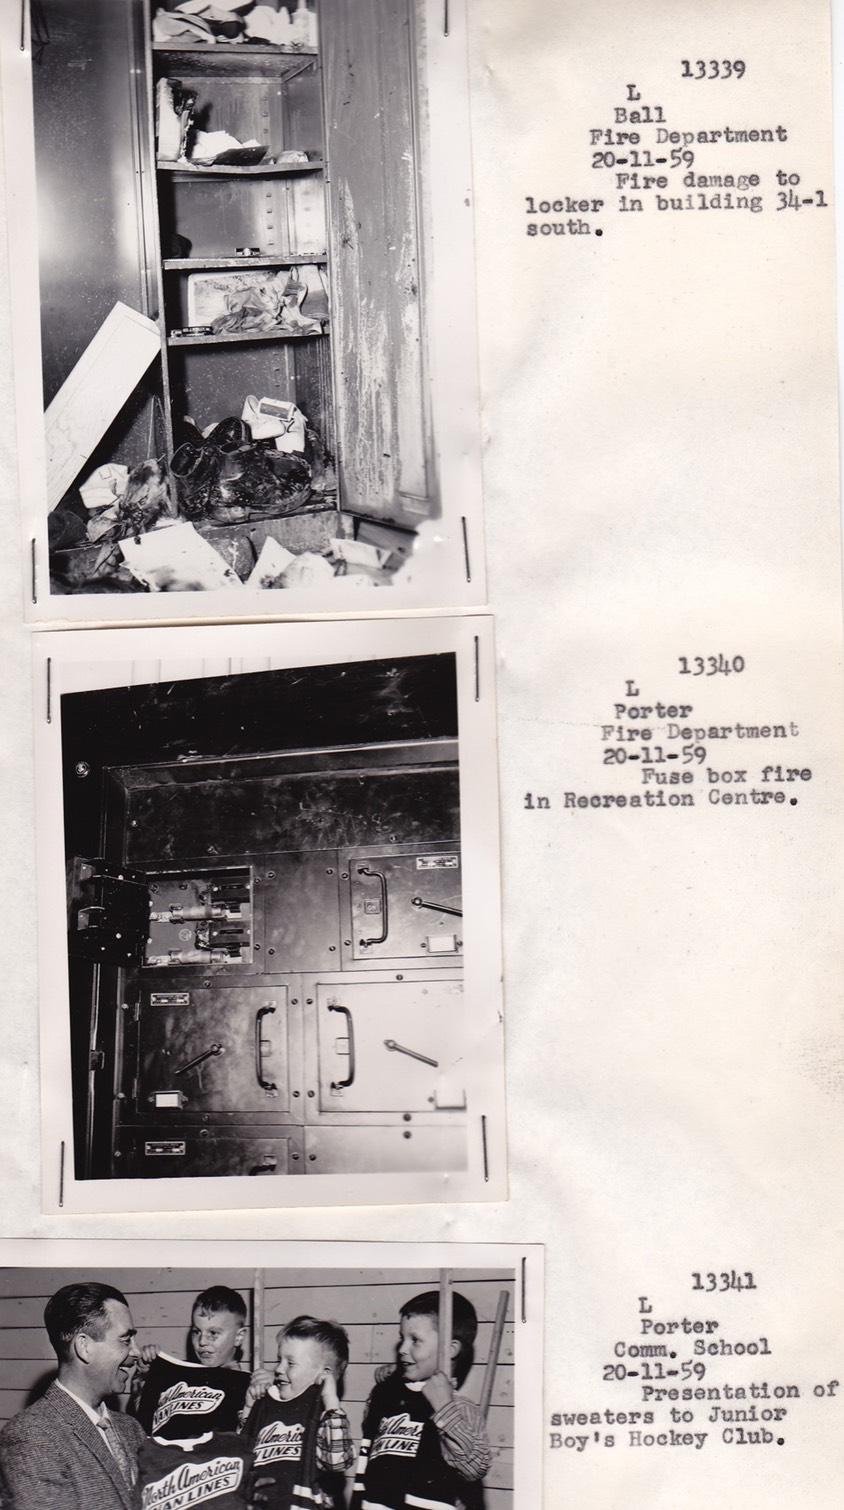 Pb11 59 Db13339 13341 Cornwallis Military Museum Fuse Box Fire